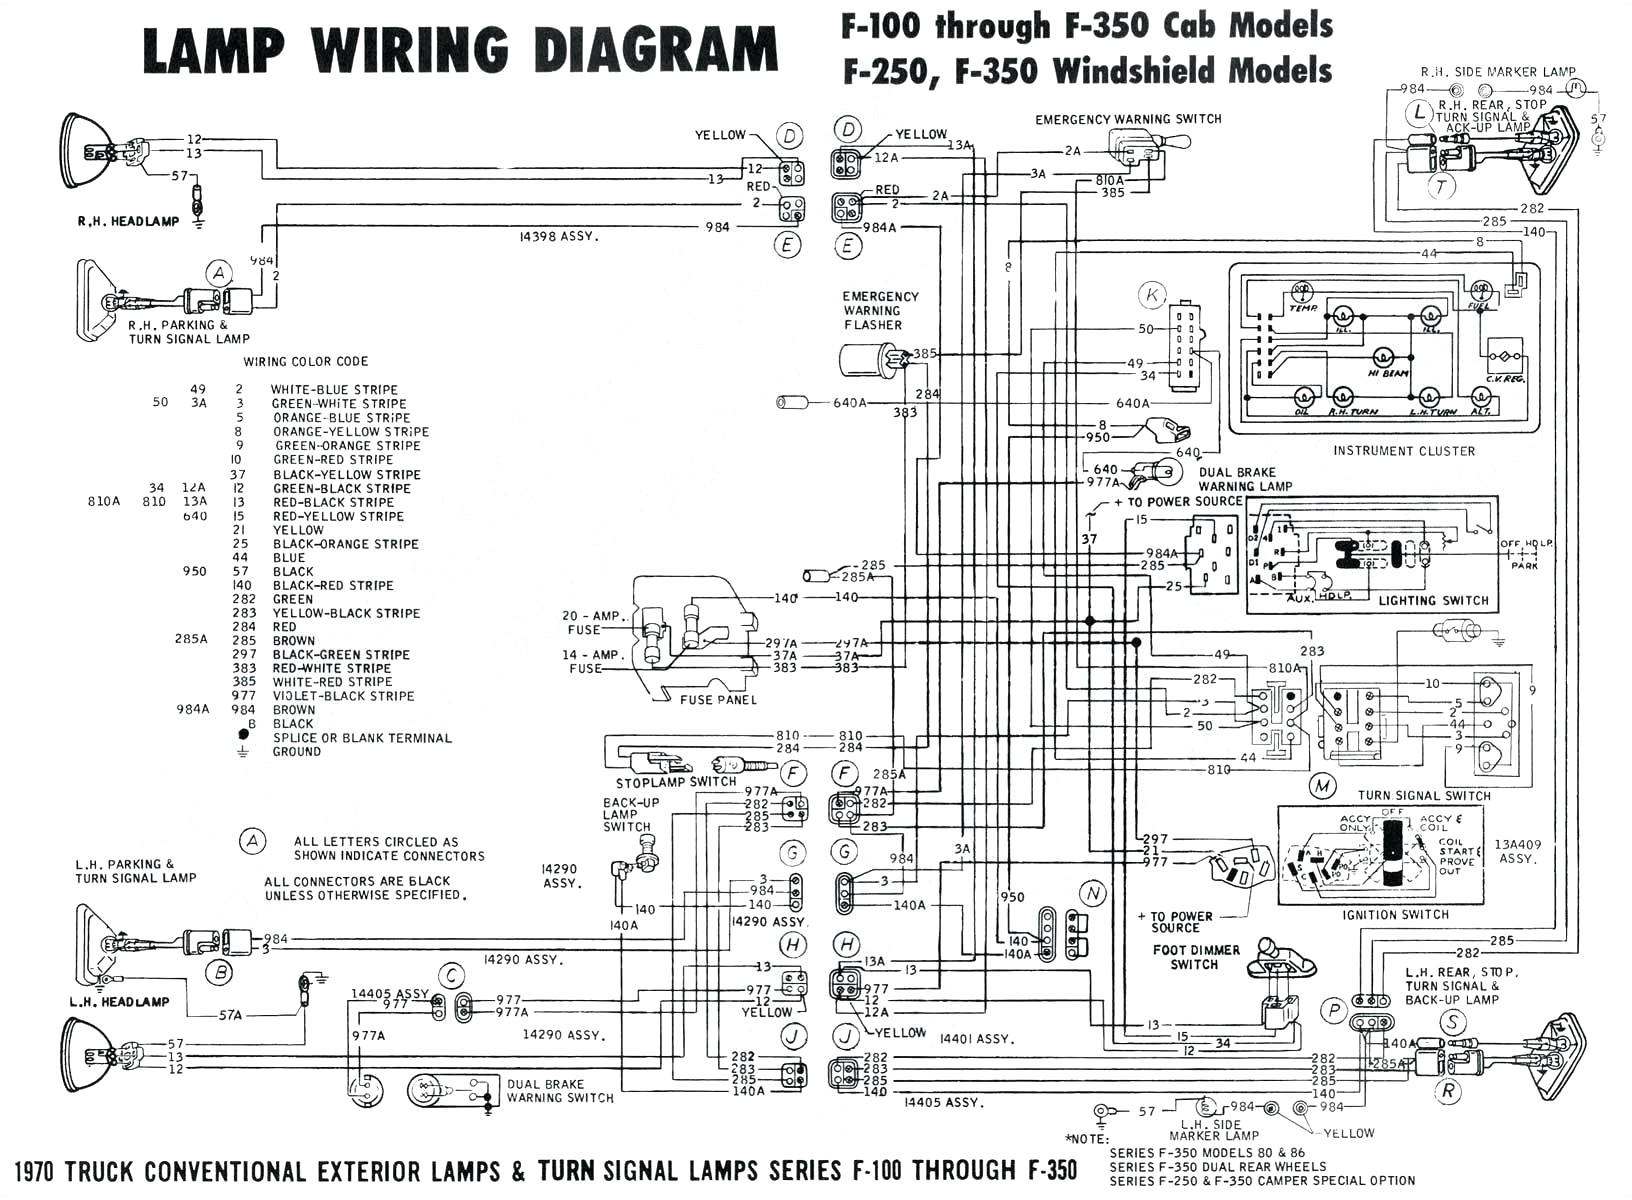 cessna 172 alternator wiring diagram wiring diagrams cessna 172 wiring diagram wiring diagram name cessna 172